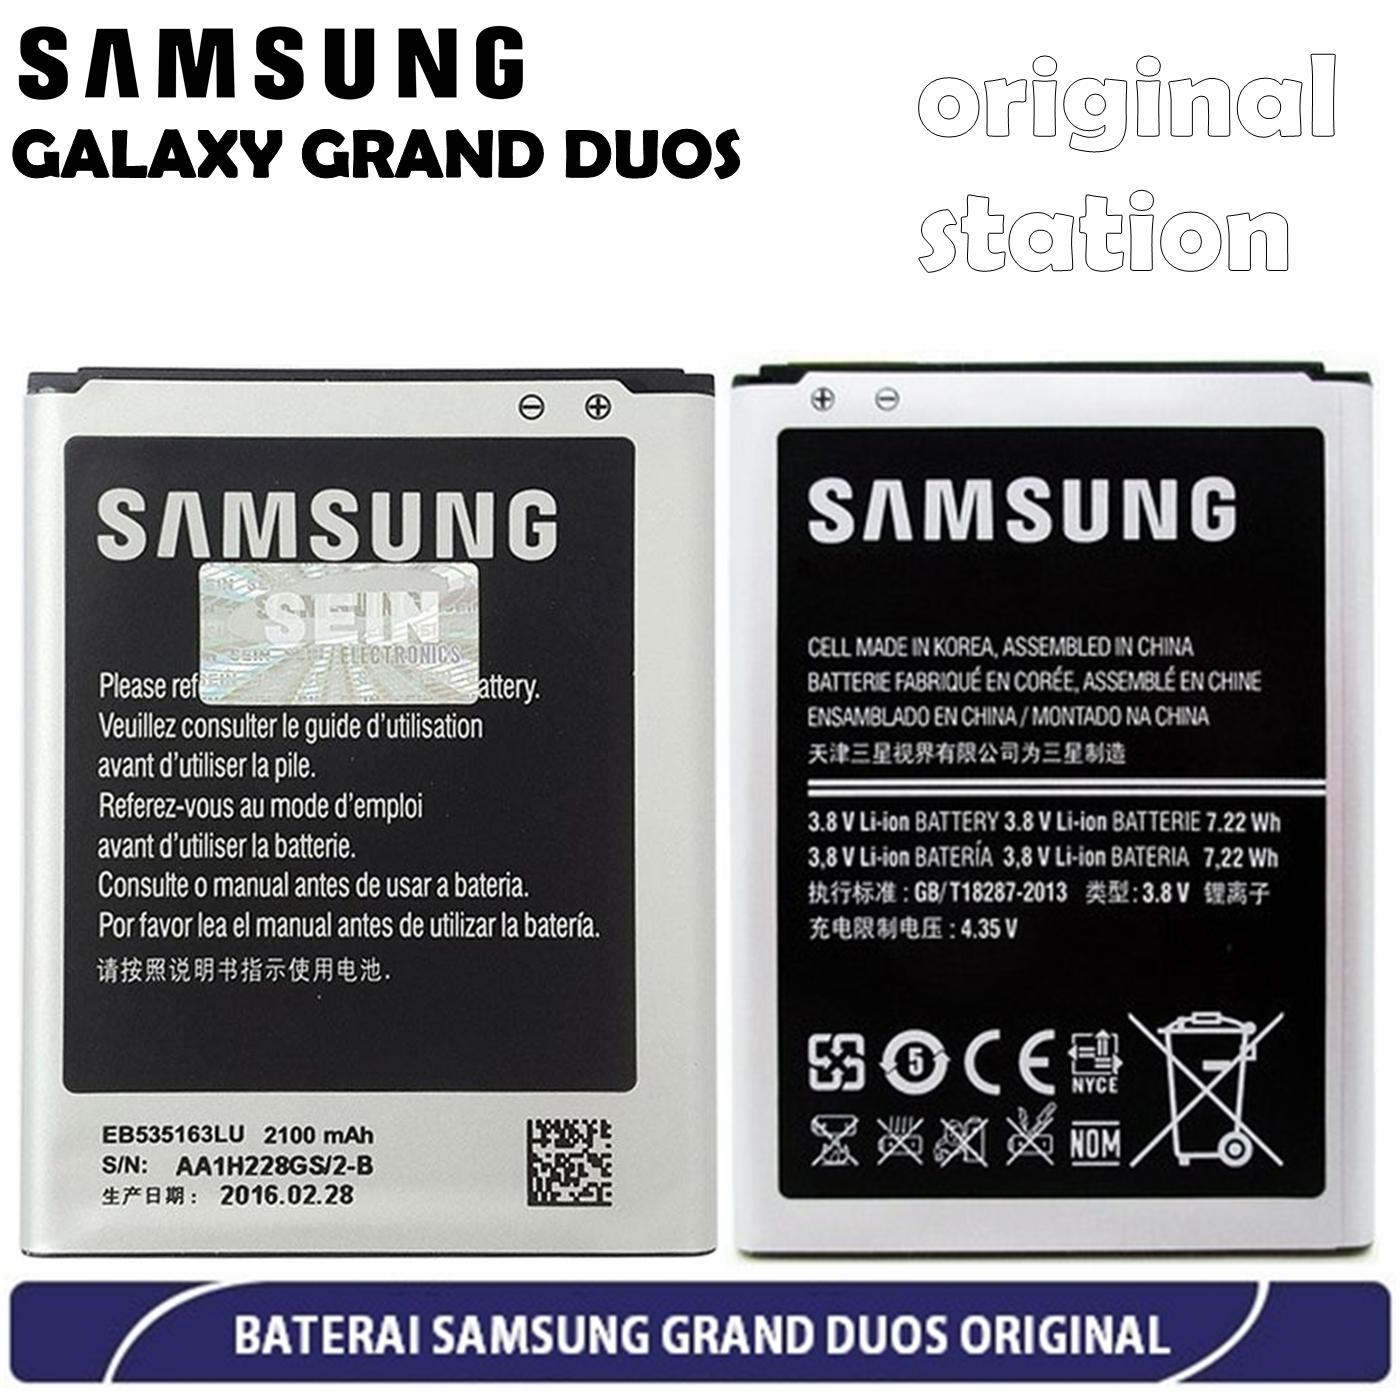 Samsung Galaxy Grand Duos I9082 Baterai Kapasitas 2100 mAh - Original